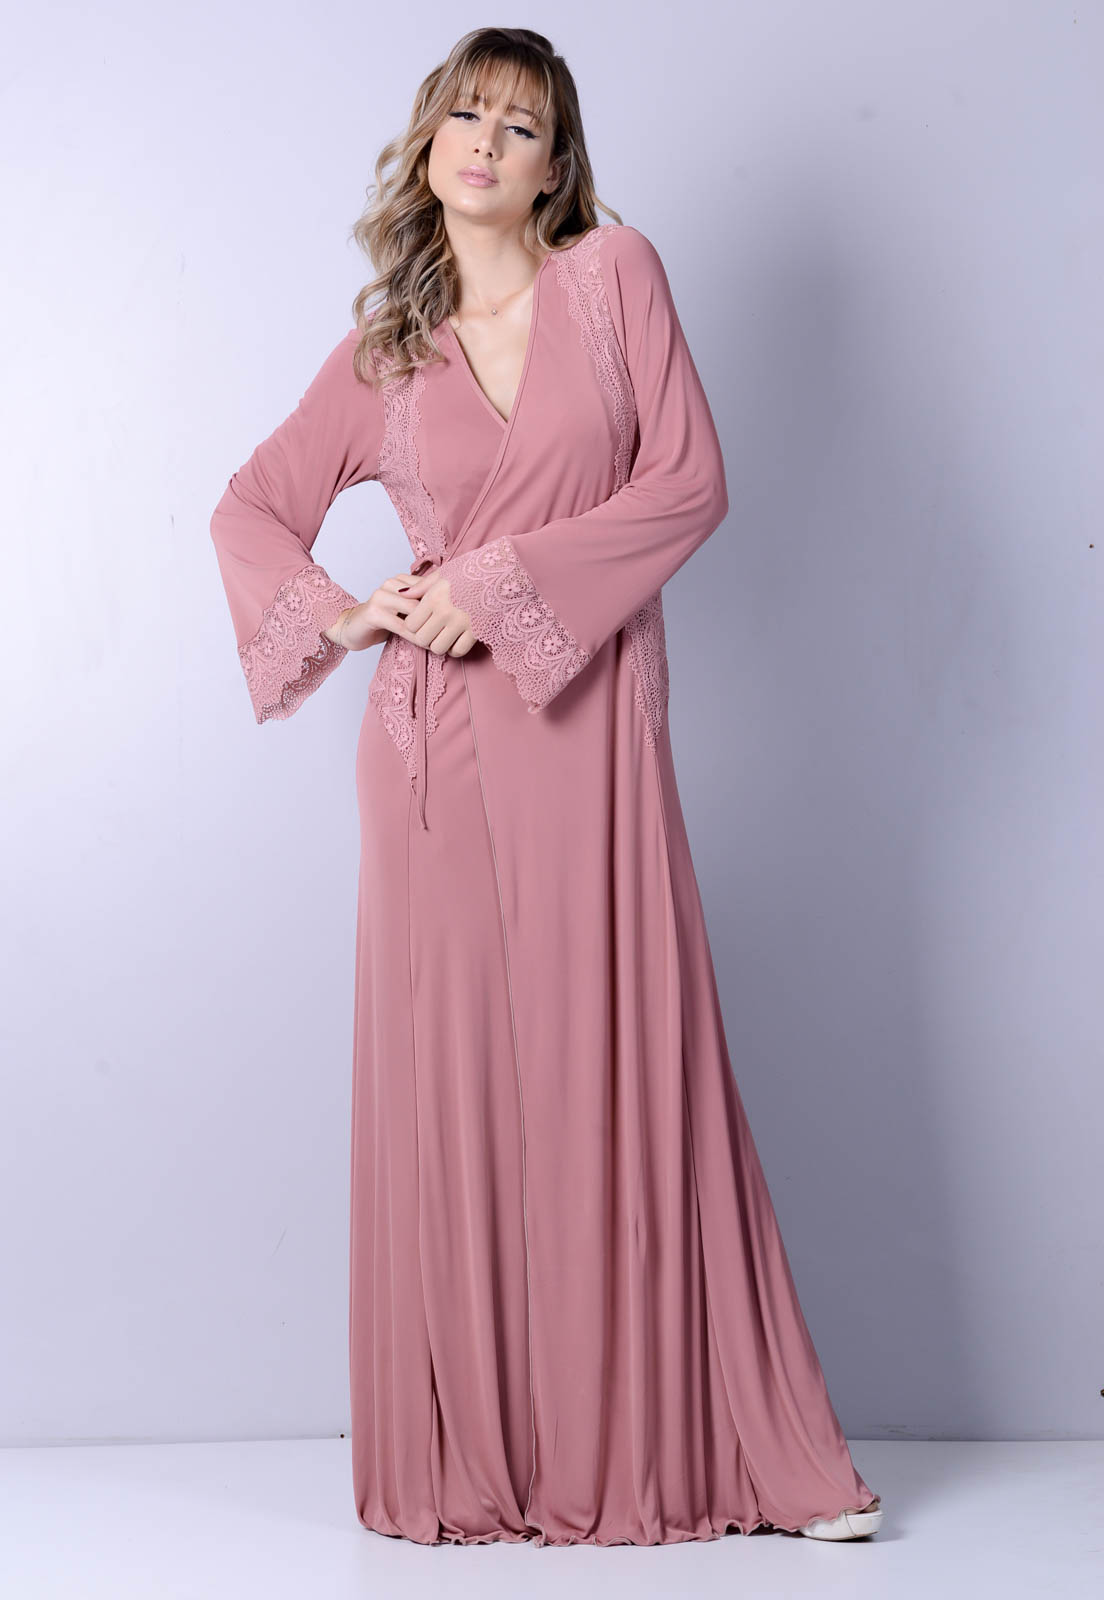 Robe Longo Romance